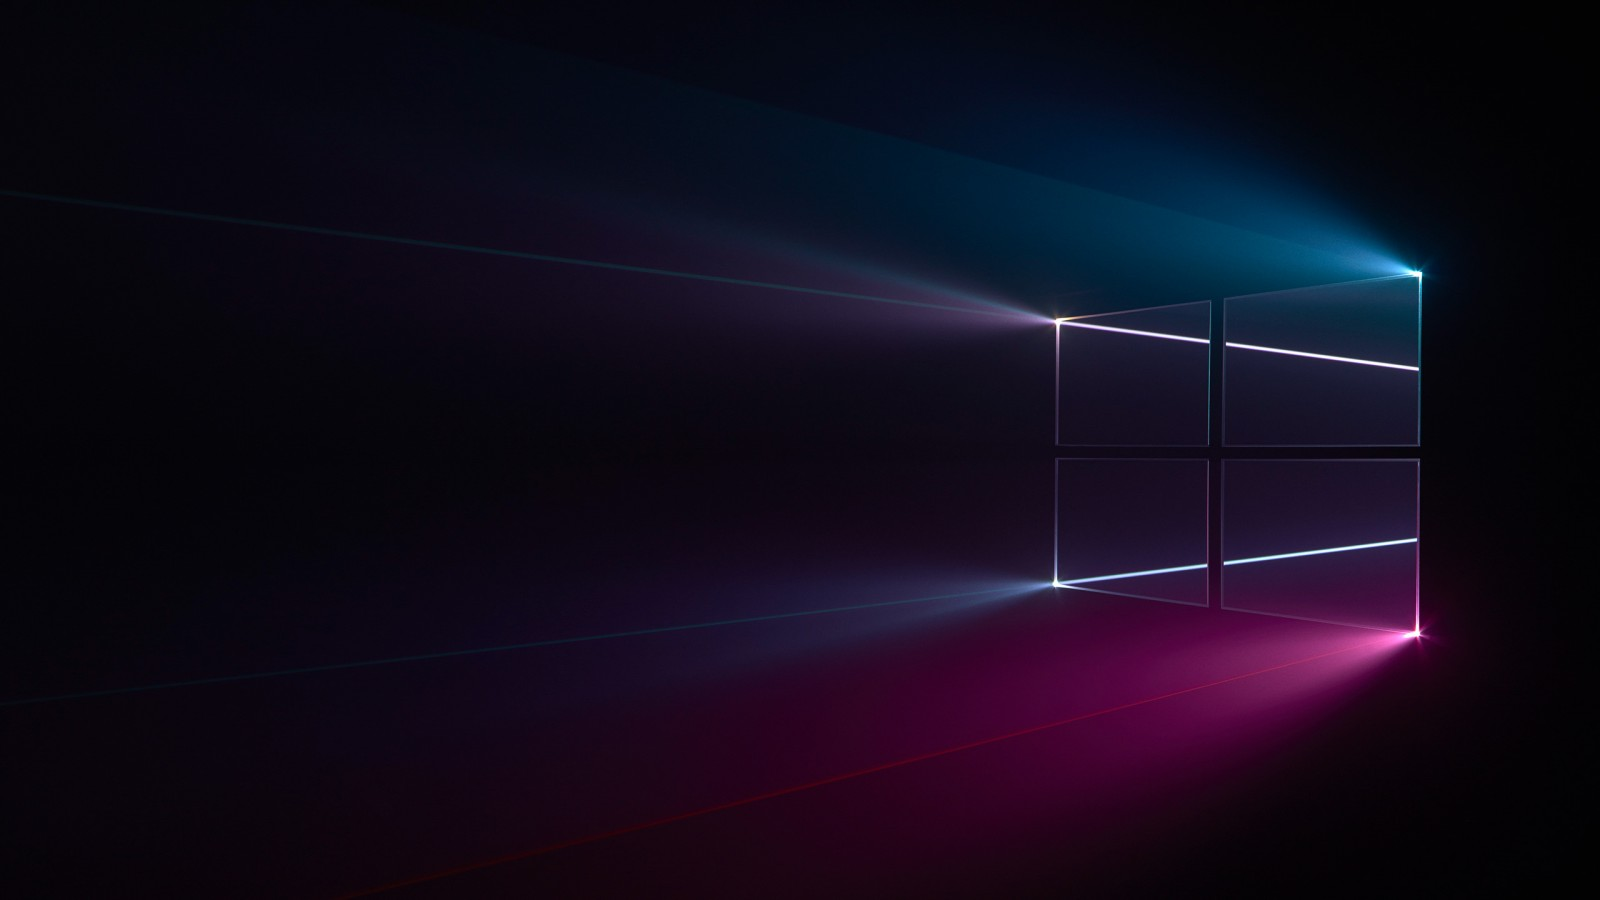 windows 10 1600x900 windows logo blue pink dark hd 10954